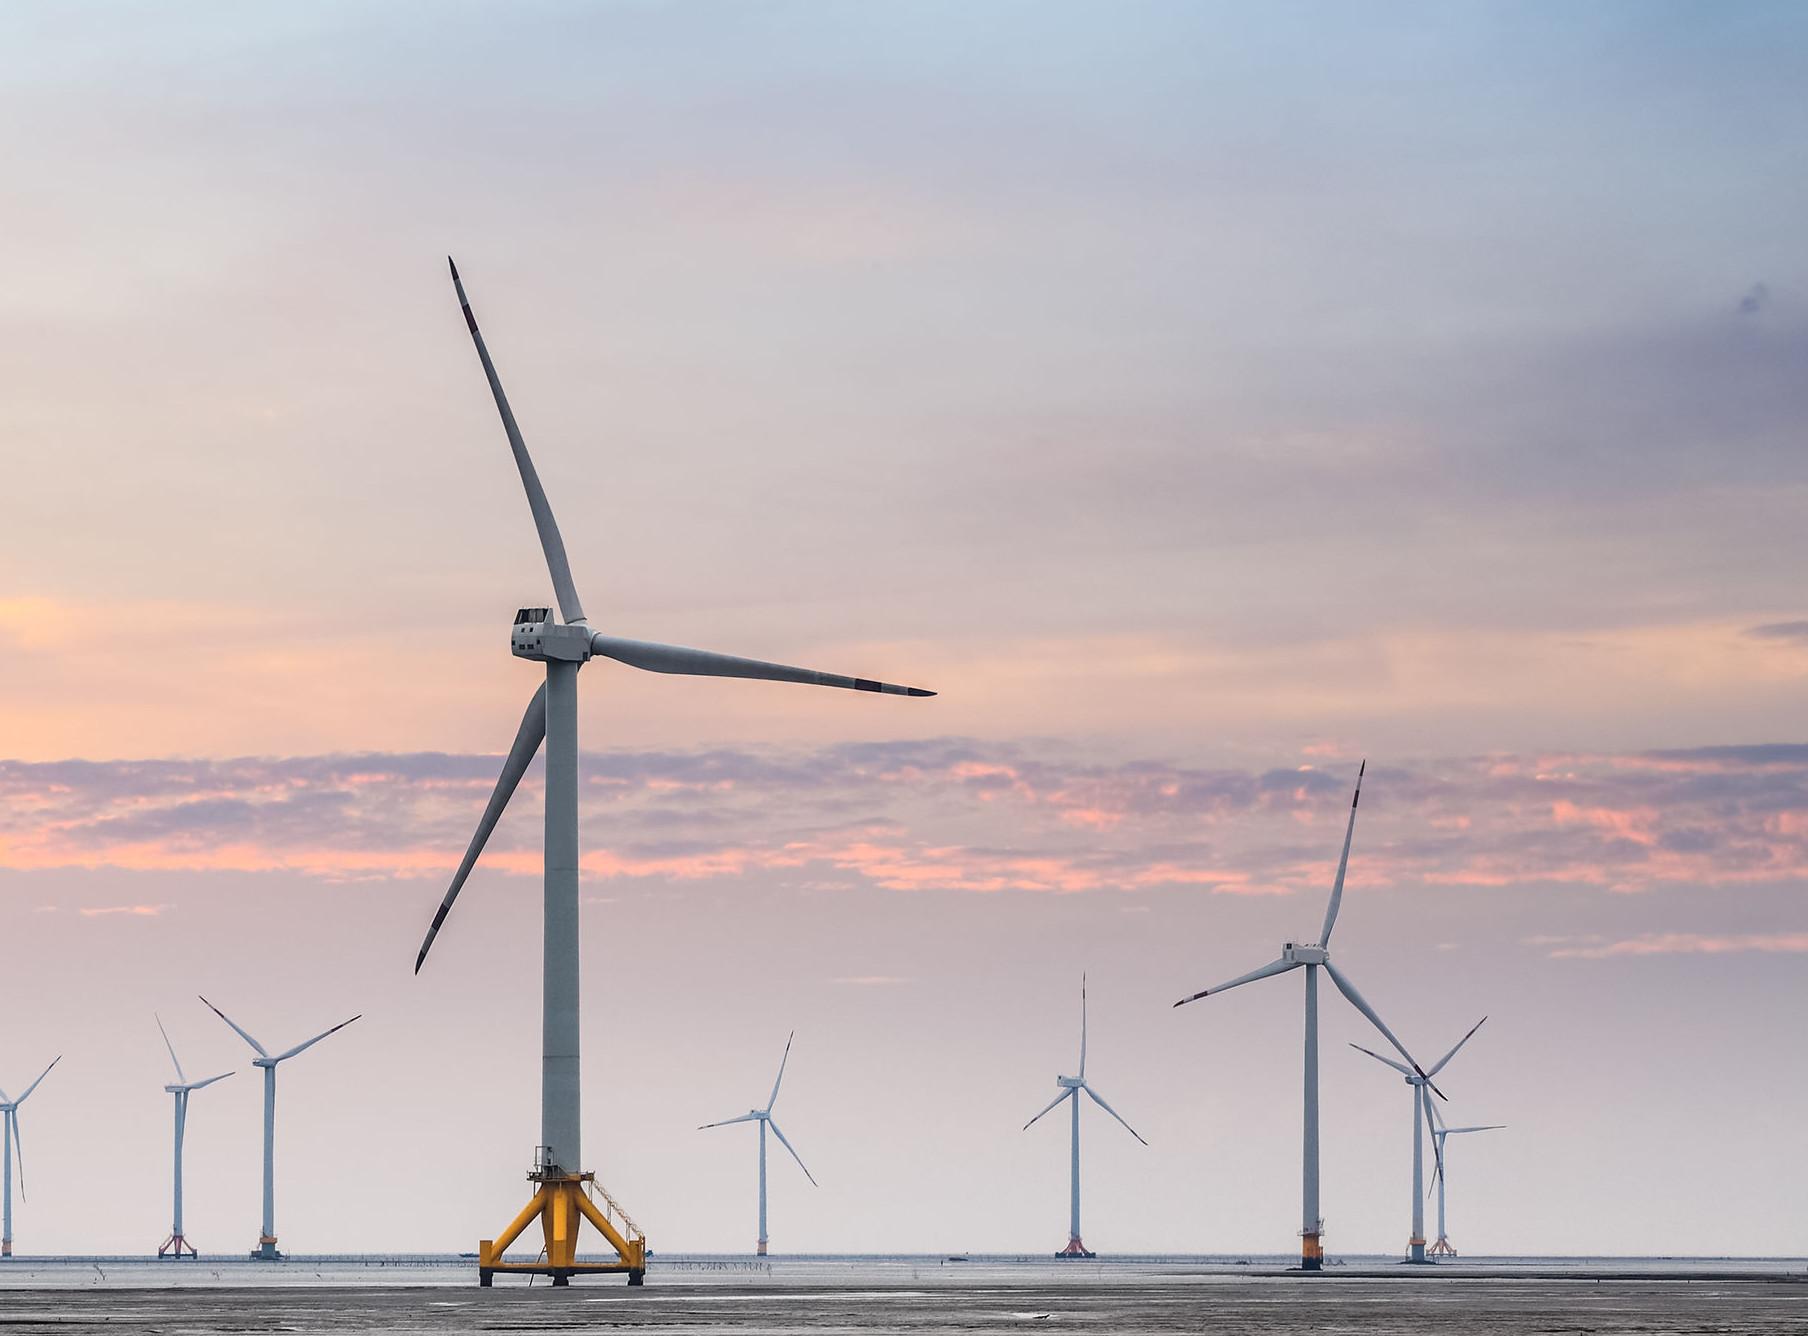 Energías Renovables Marinas: